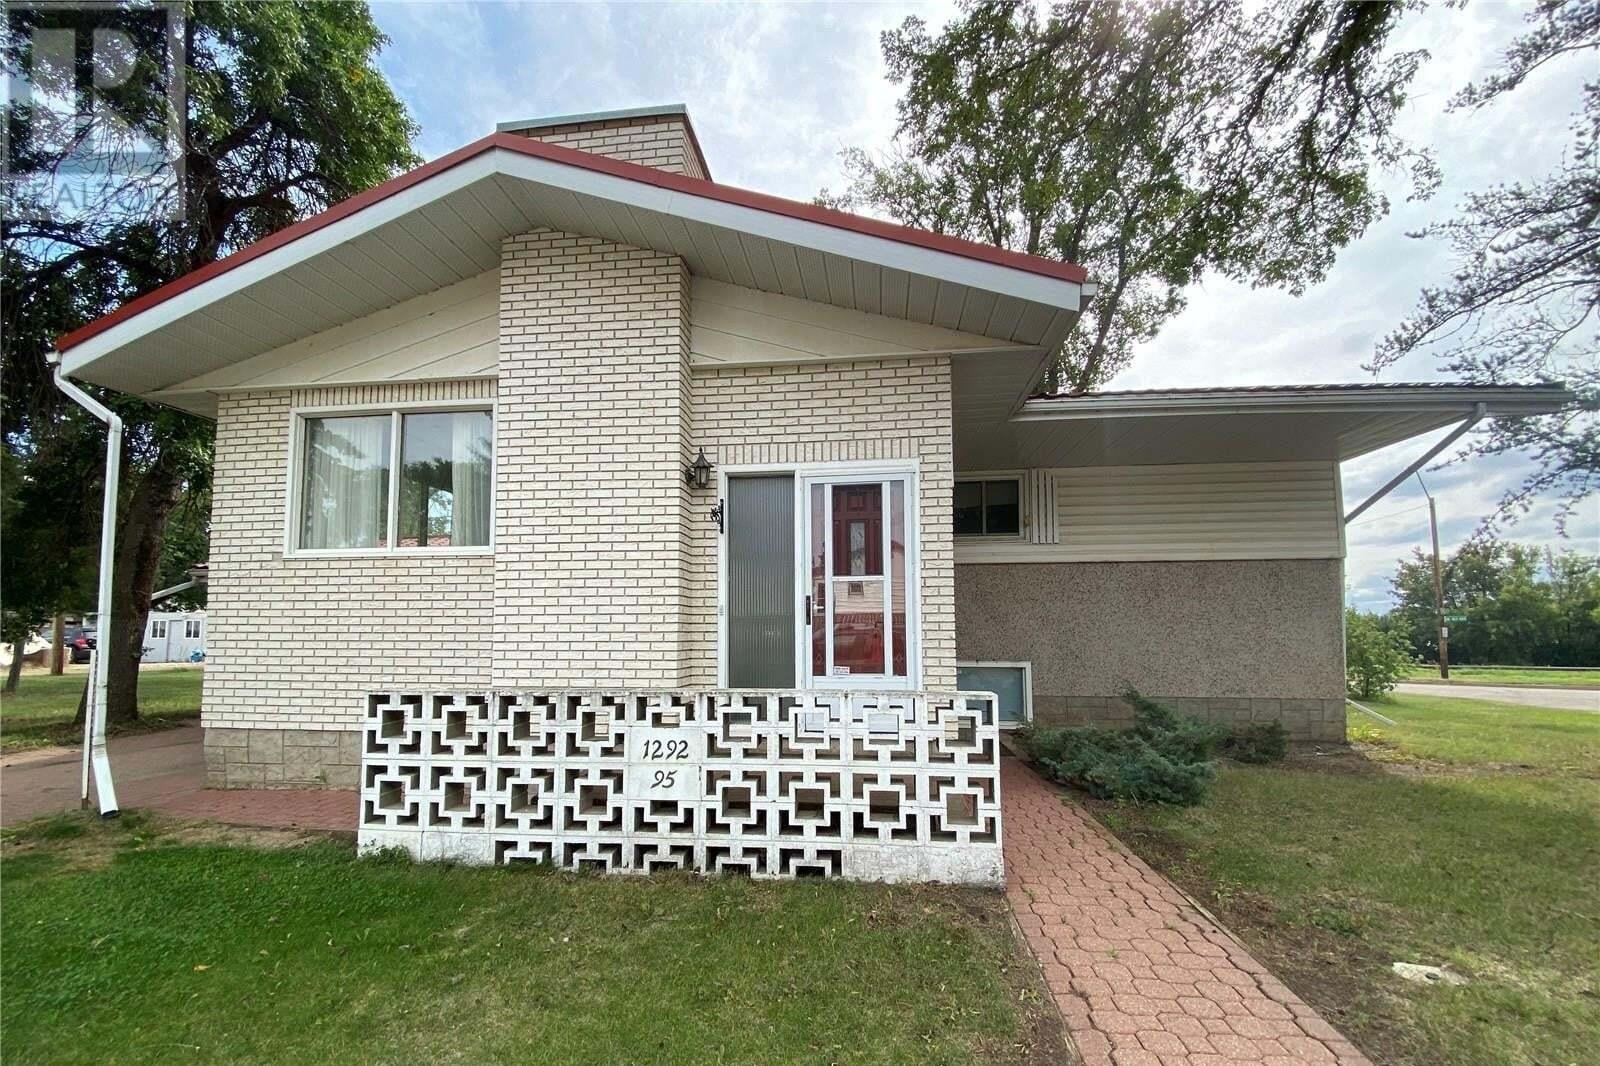 House for sale at 1292 95th St North Battleford Saskatchewan - MLS: SK824274